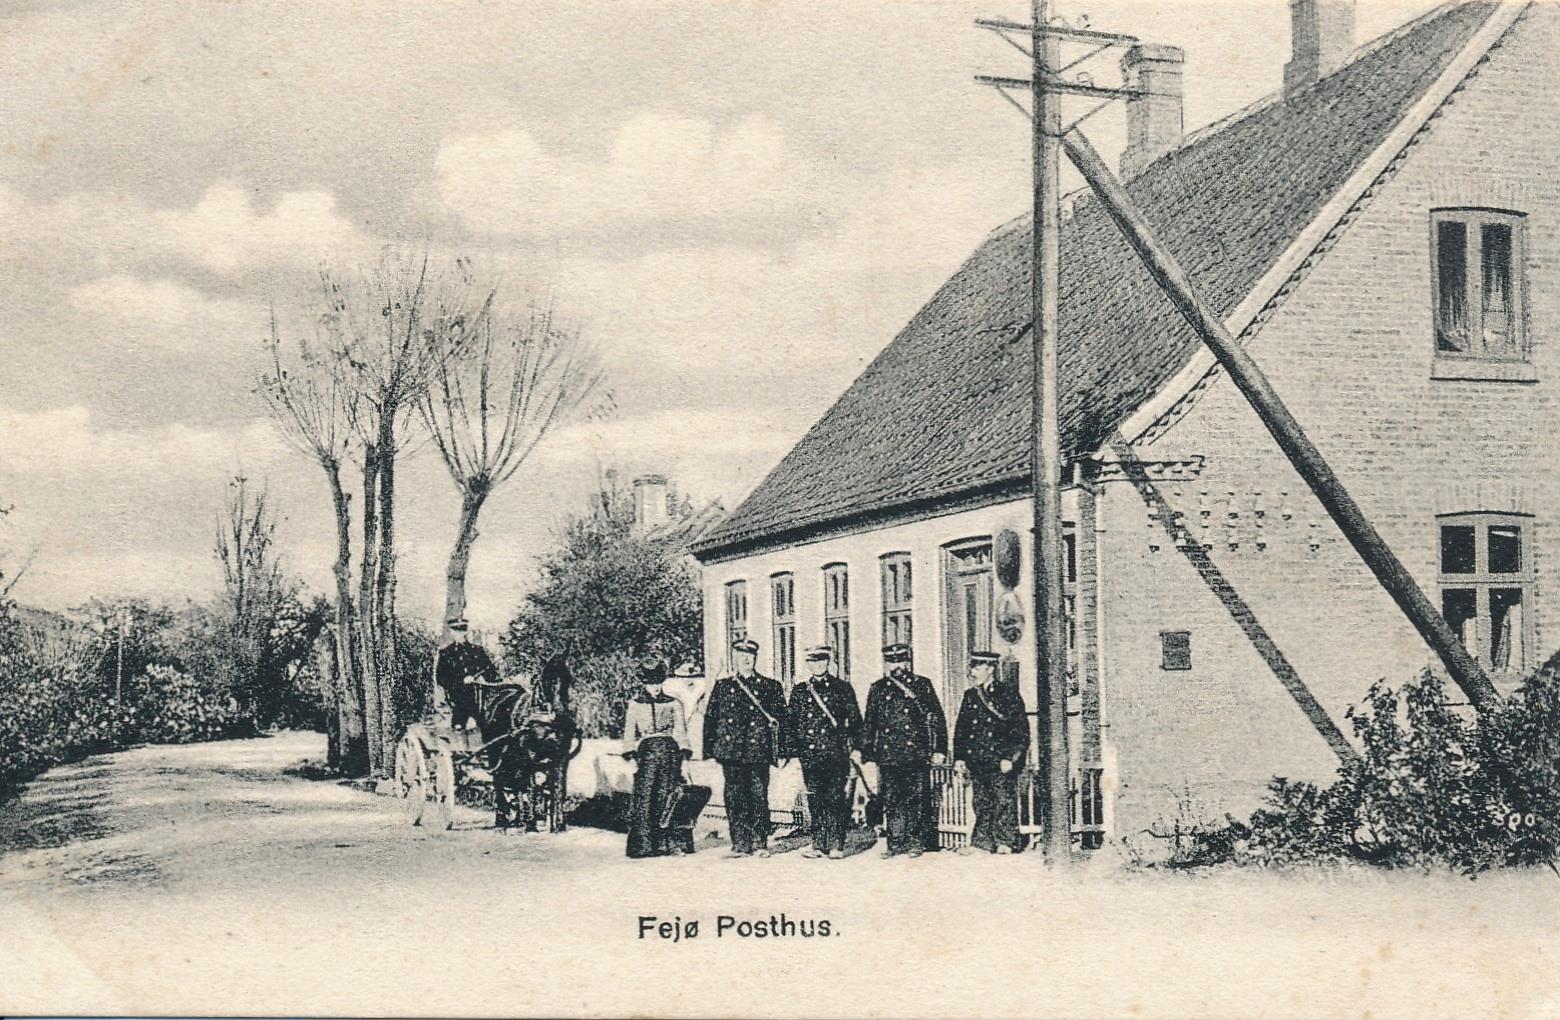 Posthuset, Herredsvej 264, Østerby, Fejø, postkort, cirka 1910